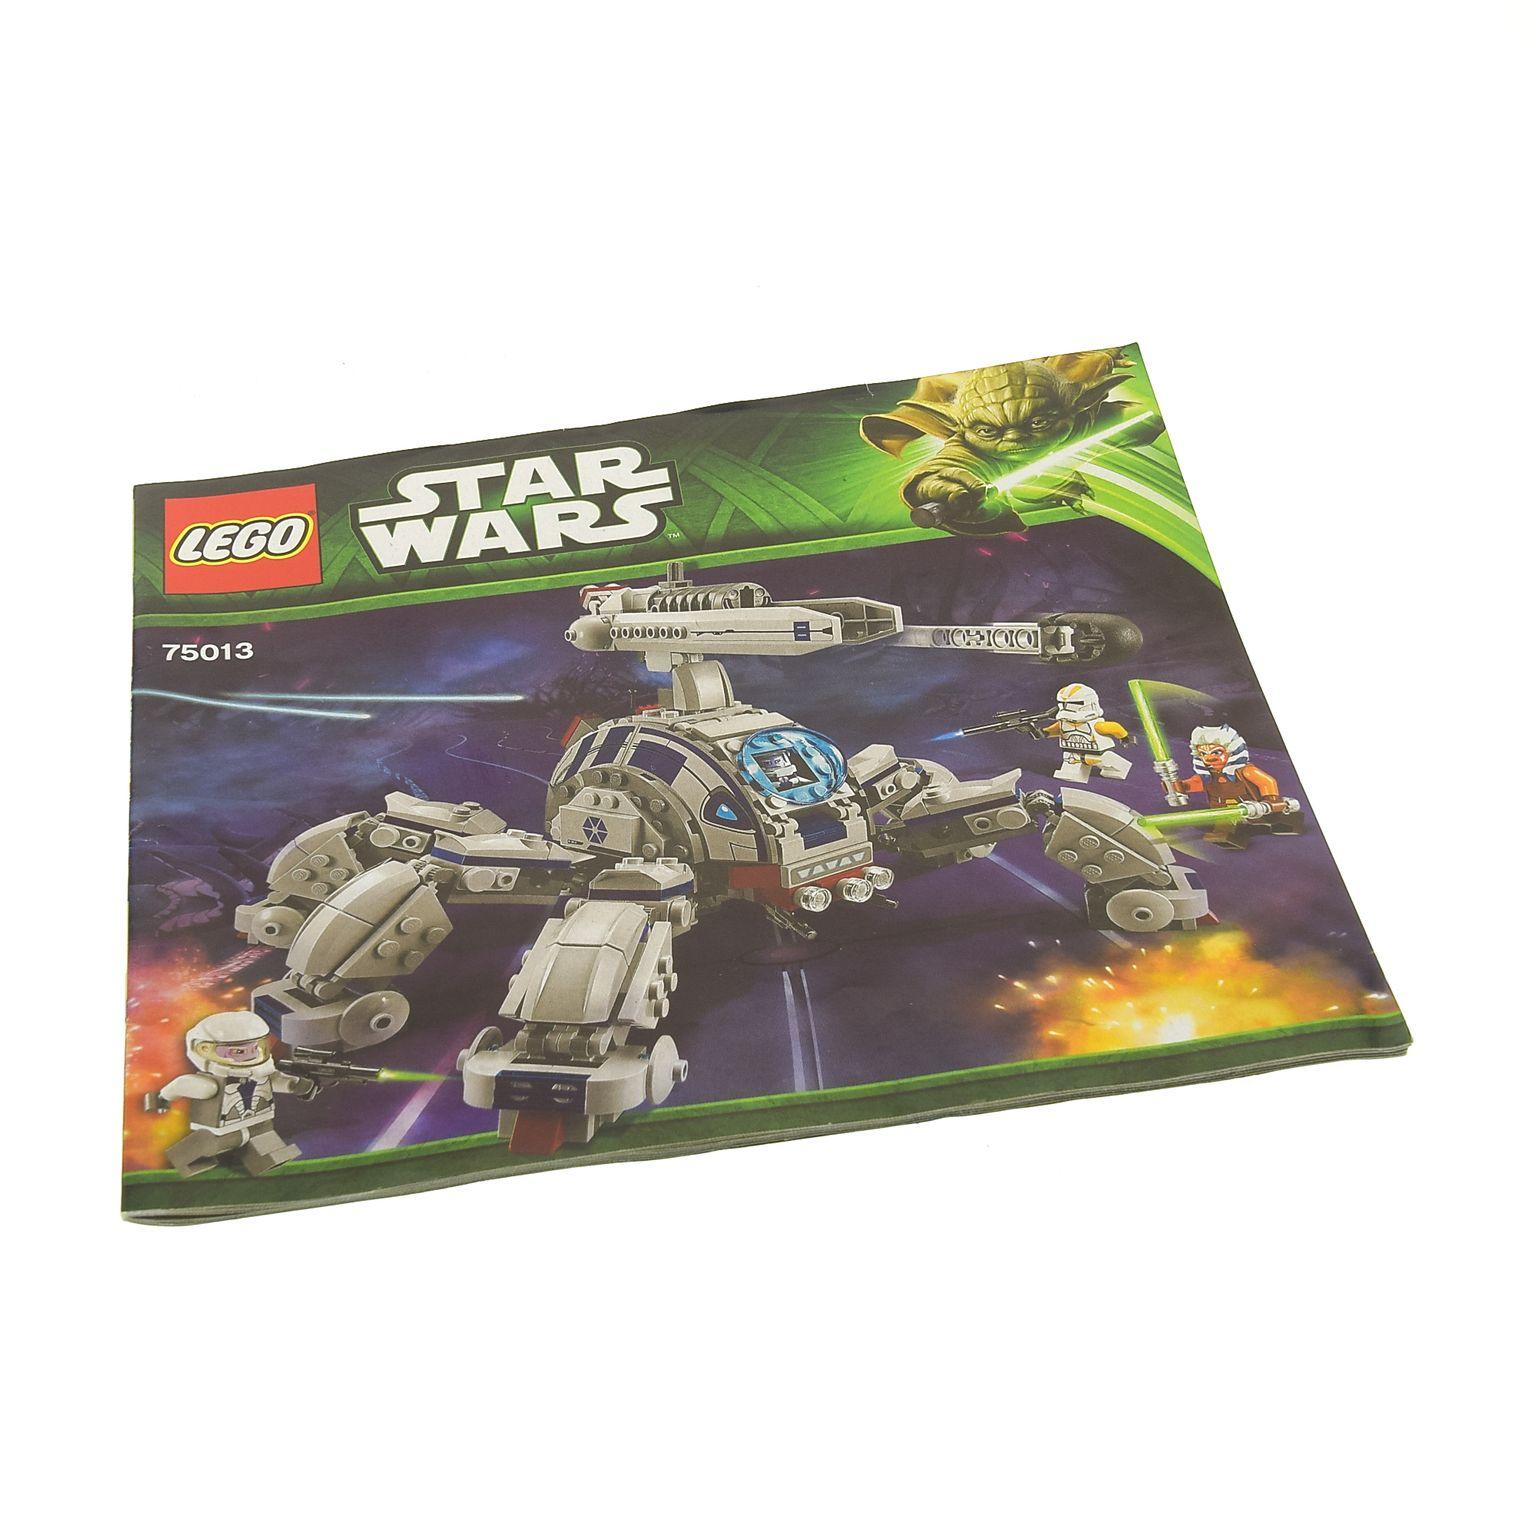 1 x lego system bauanleitung star wars clone wars umbaran mhc mobile kanone l ufer 75013. Black Bedroom Furniture Sets. Home Design Ideas